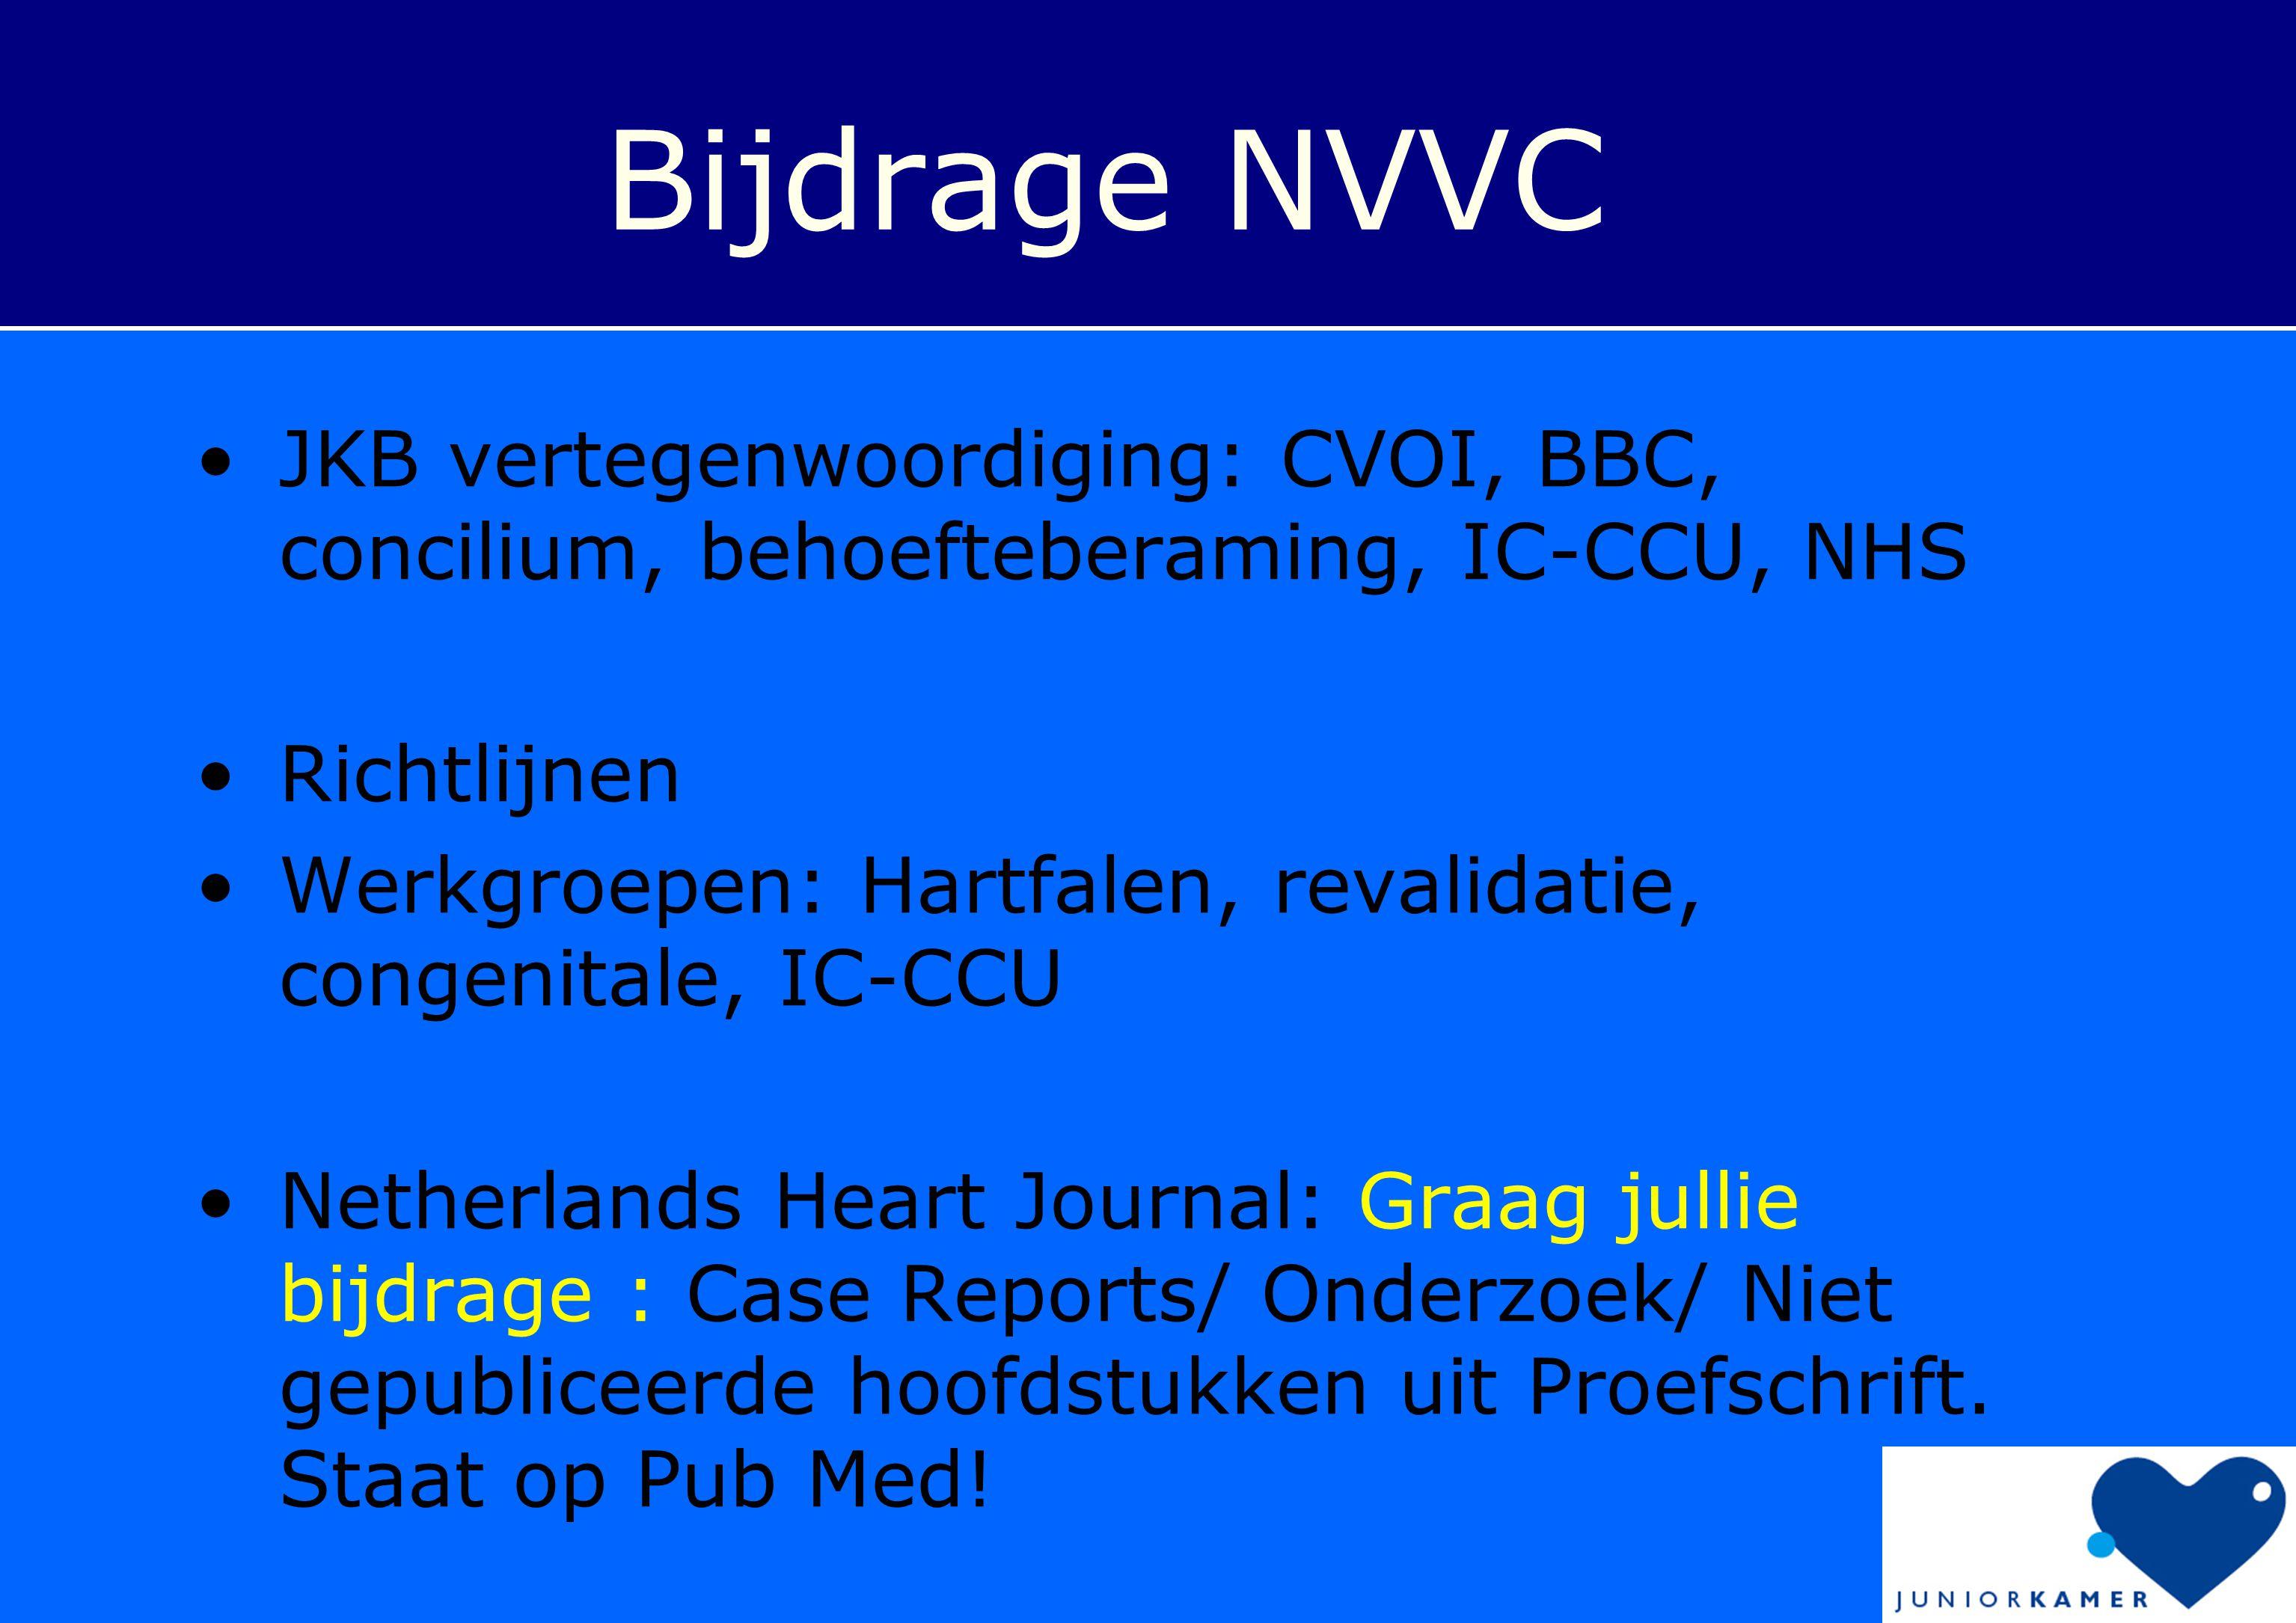 Bijdrage NVVC •JKB vertegenwoordiging: CVOI, BBC, concilium, behoefteberaming, IC-CCU, NHS •Richtlijnen •Werkgroepen: Hartfalen, revalidatie, congenit